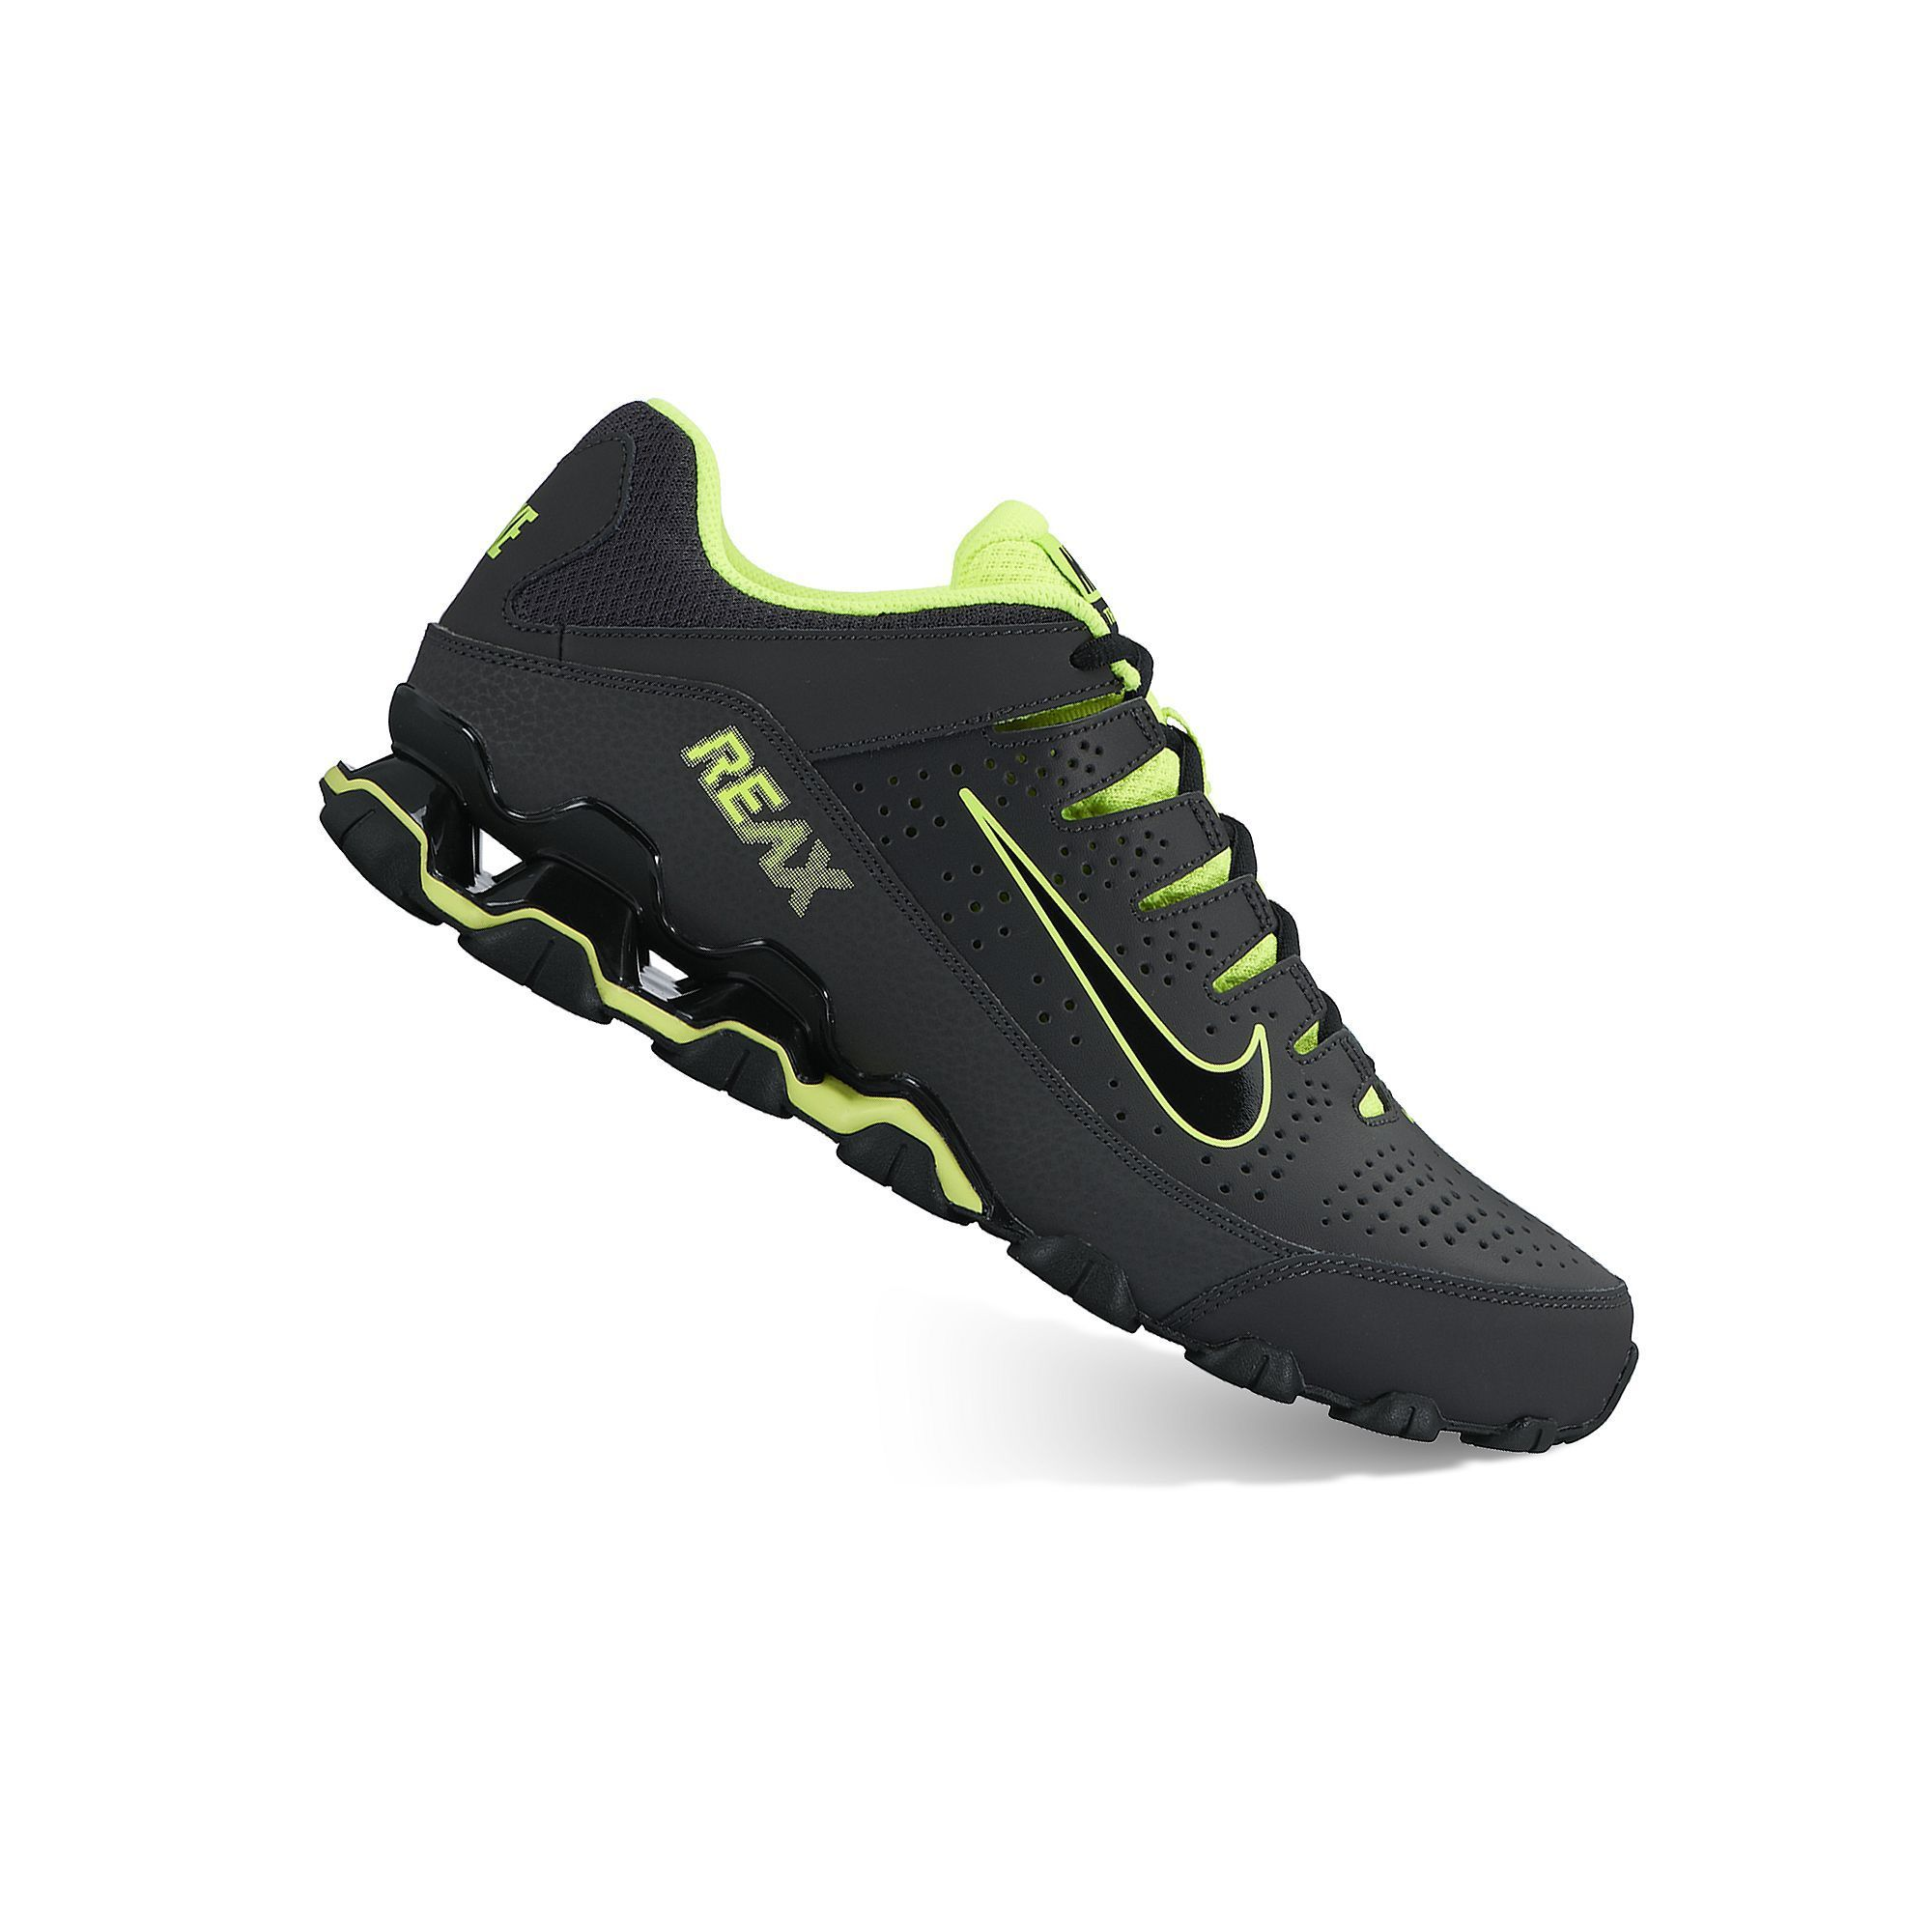 Nike Reax 8 TR Men s Cross-Training Shoes   Products   Pinterest ... 8f9c412e6fc3